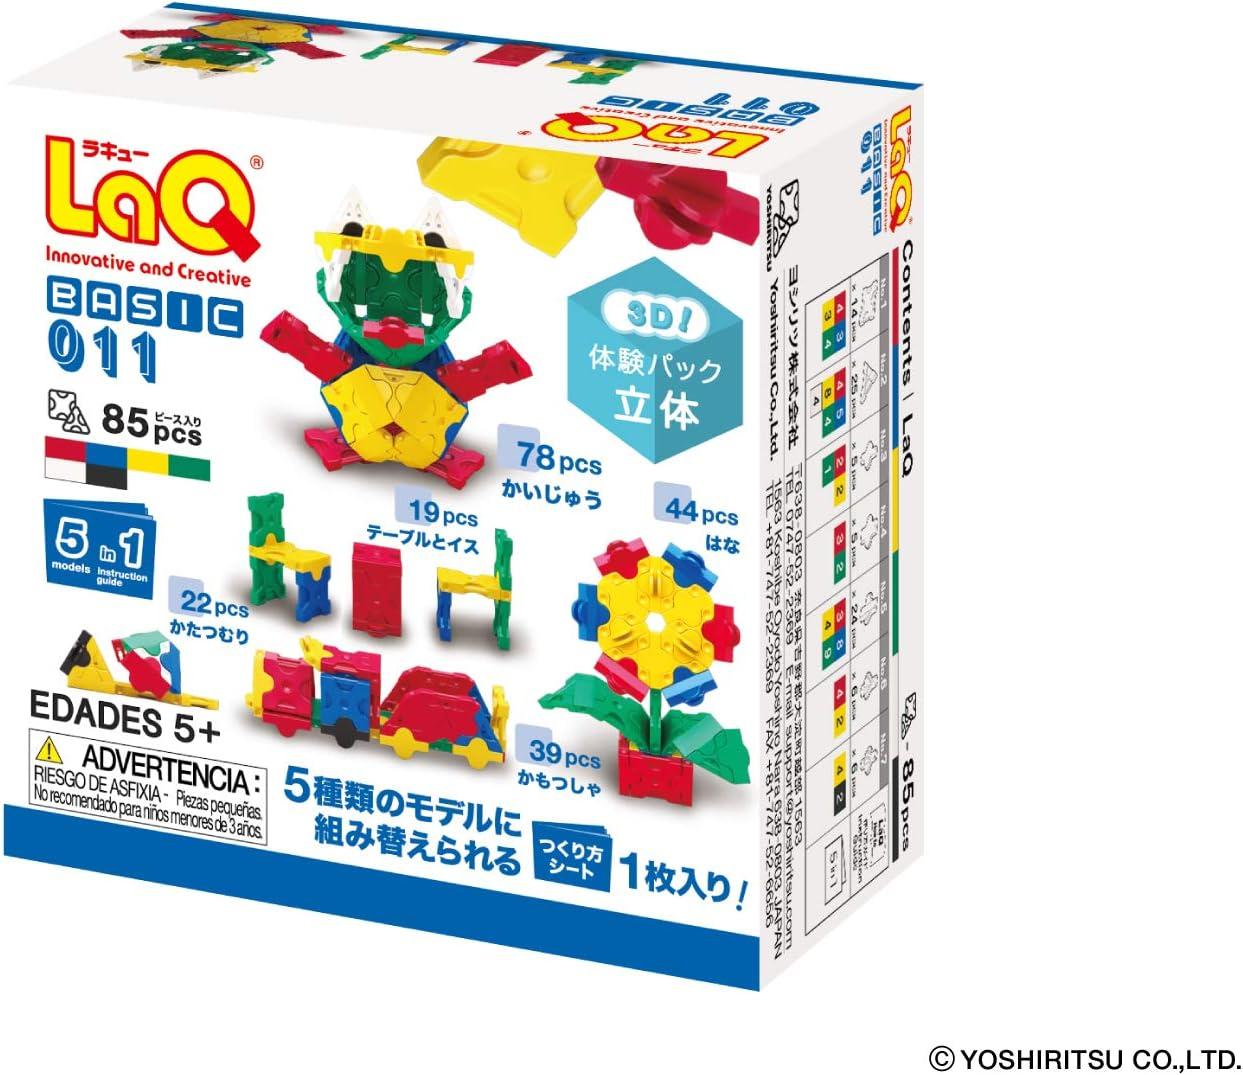 LaQ Basic 011 Cubic Model Building Kit